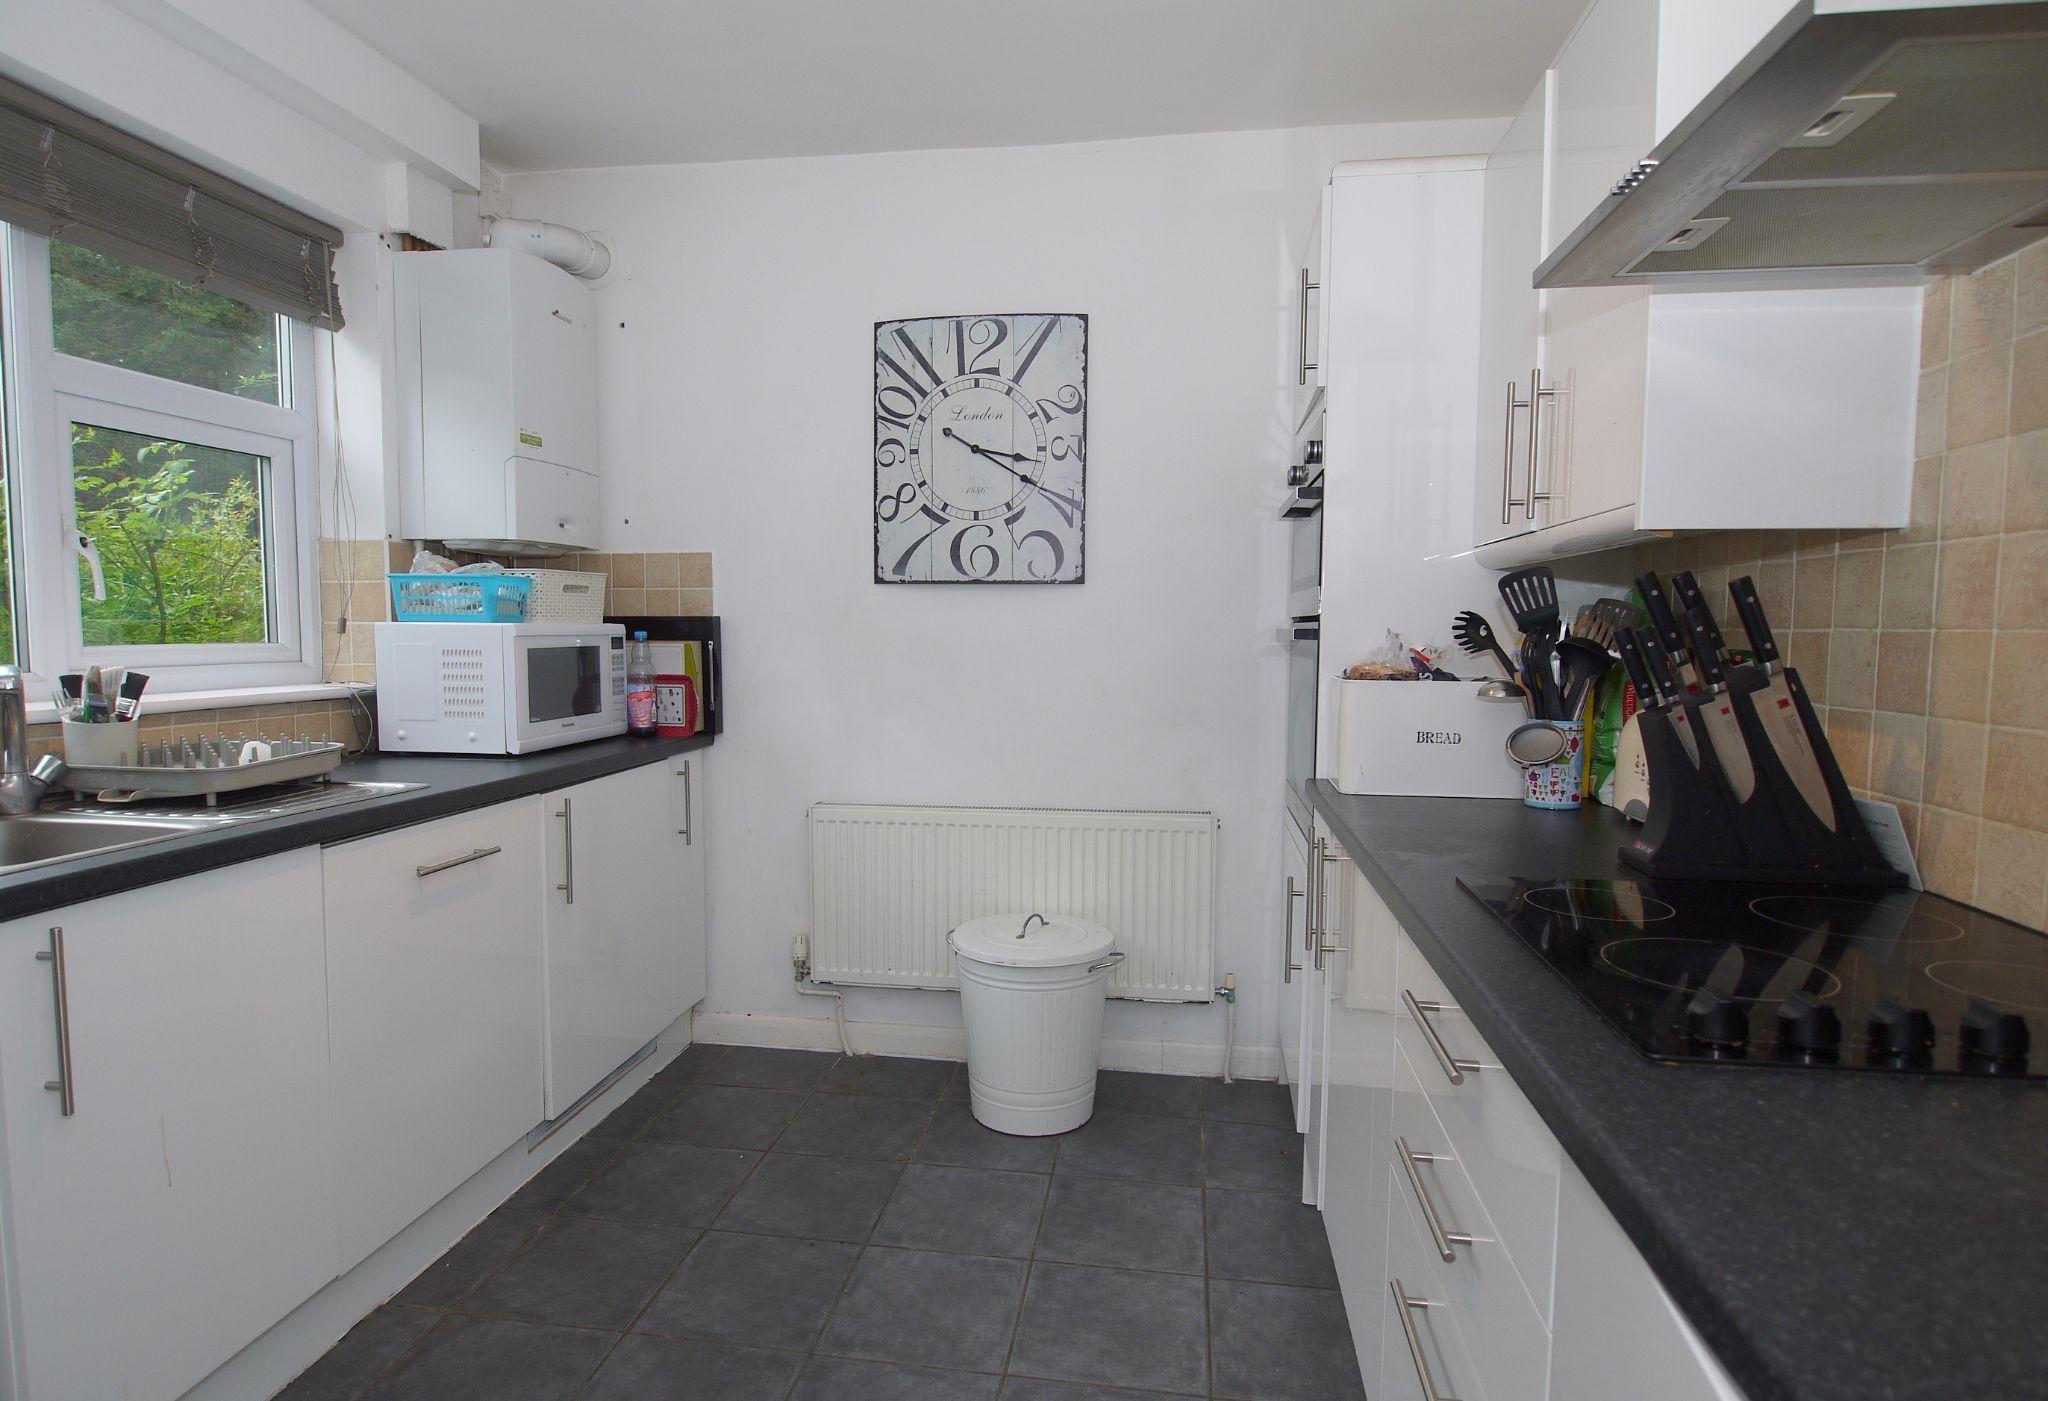 3 bedroom apartment Sale Agreed in Sevenoaks - Photograph 4